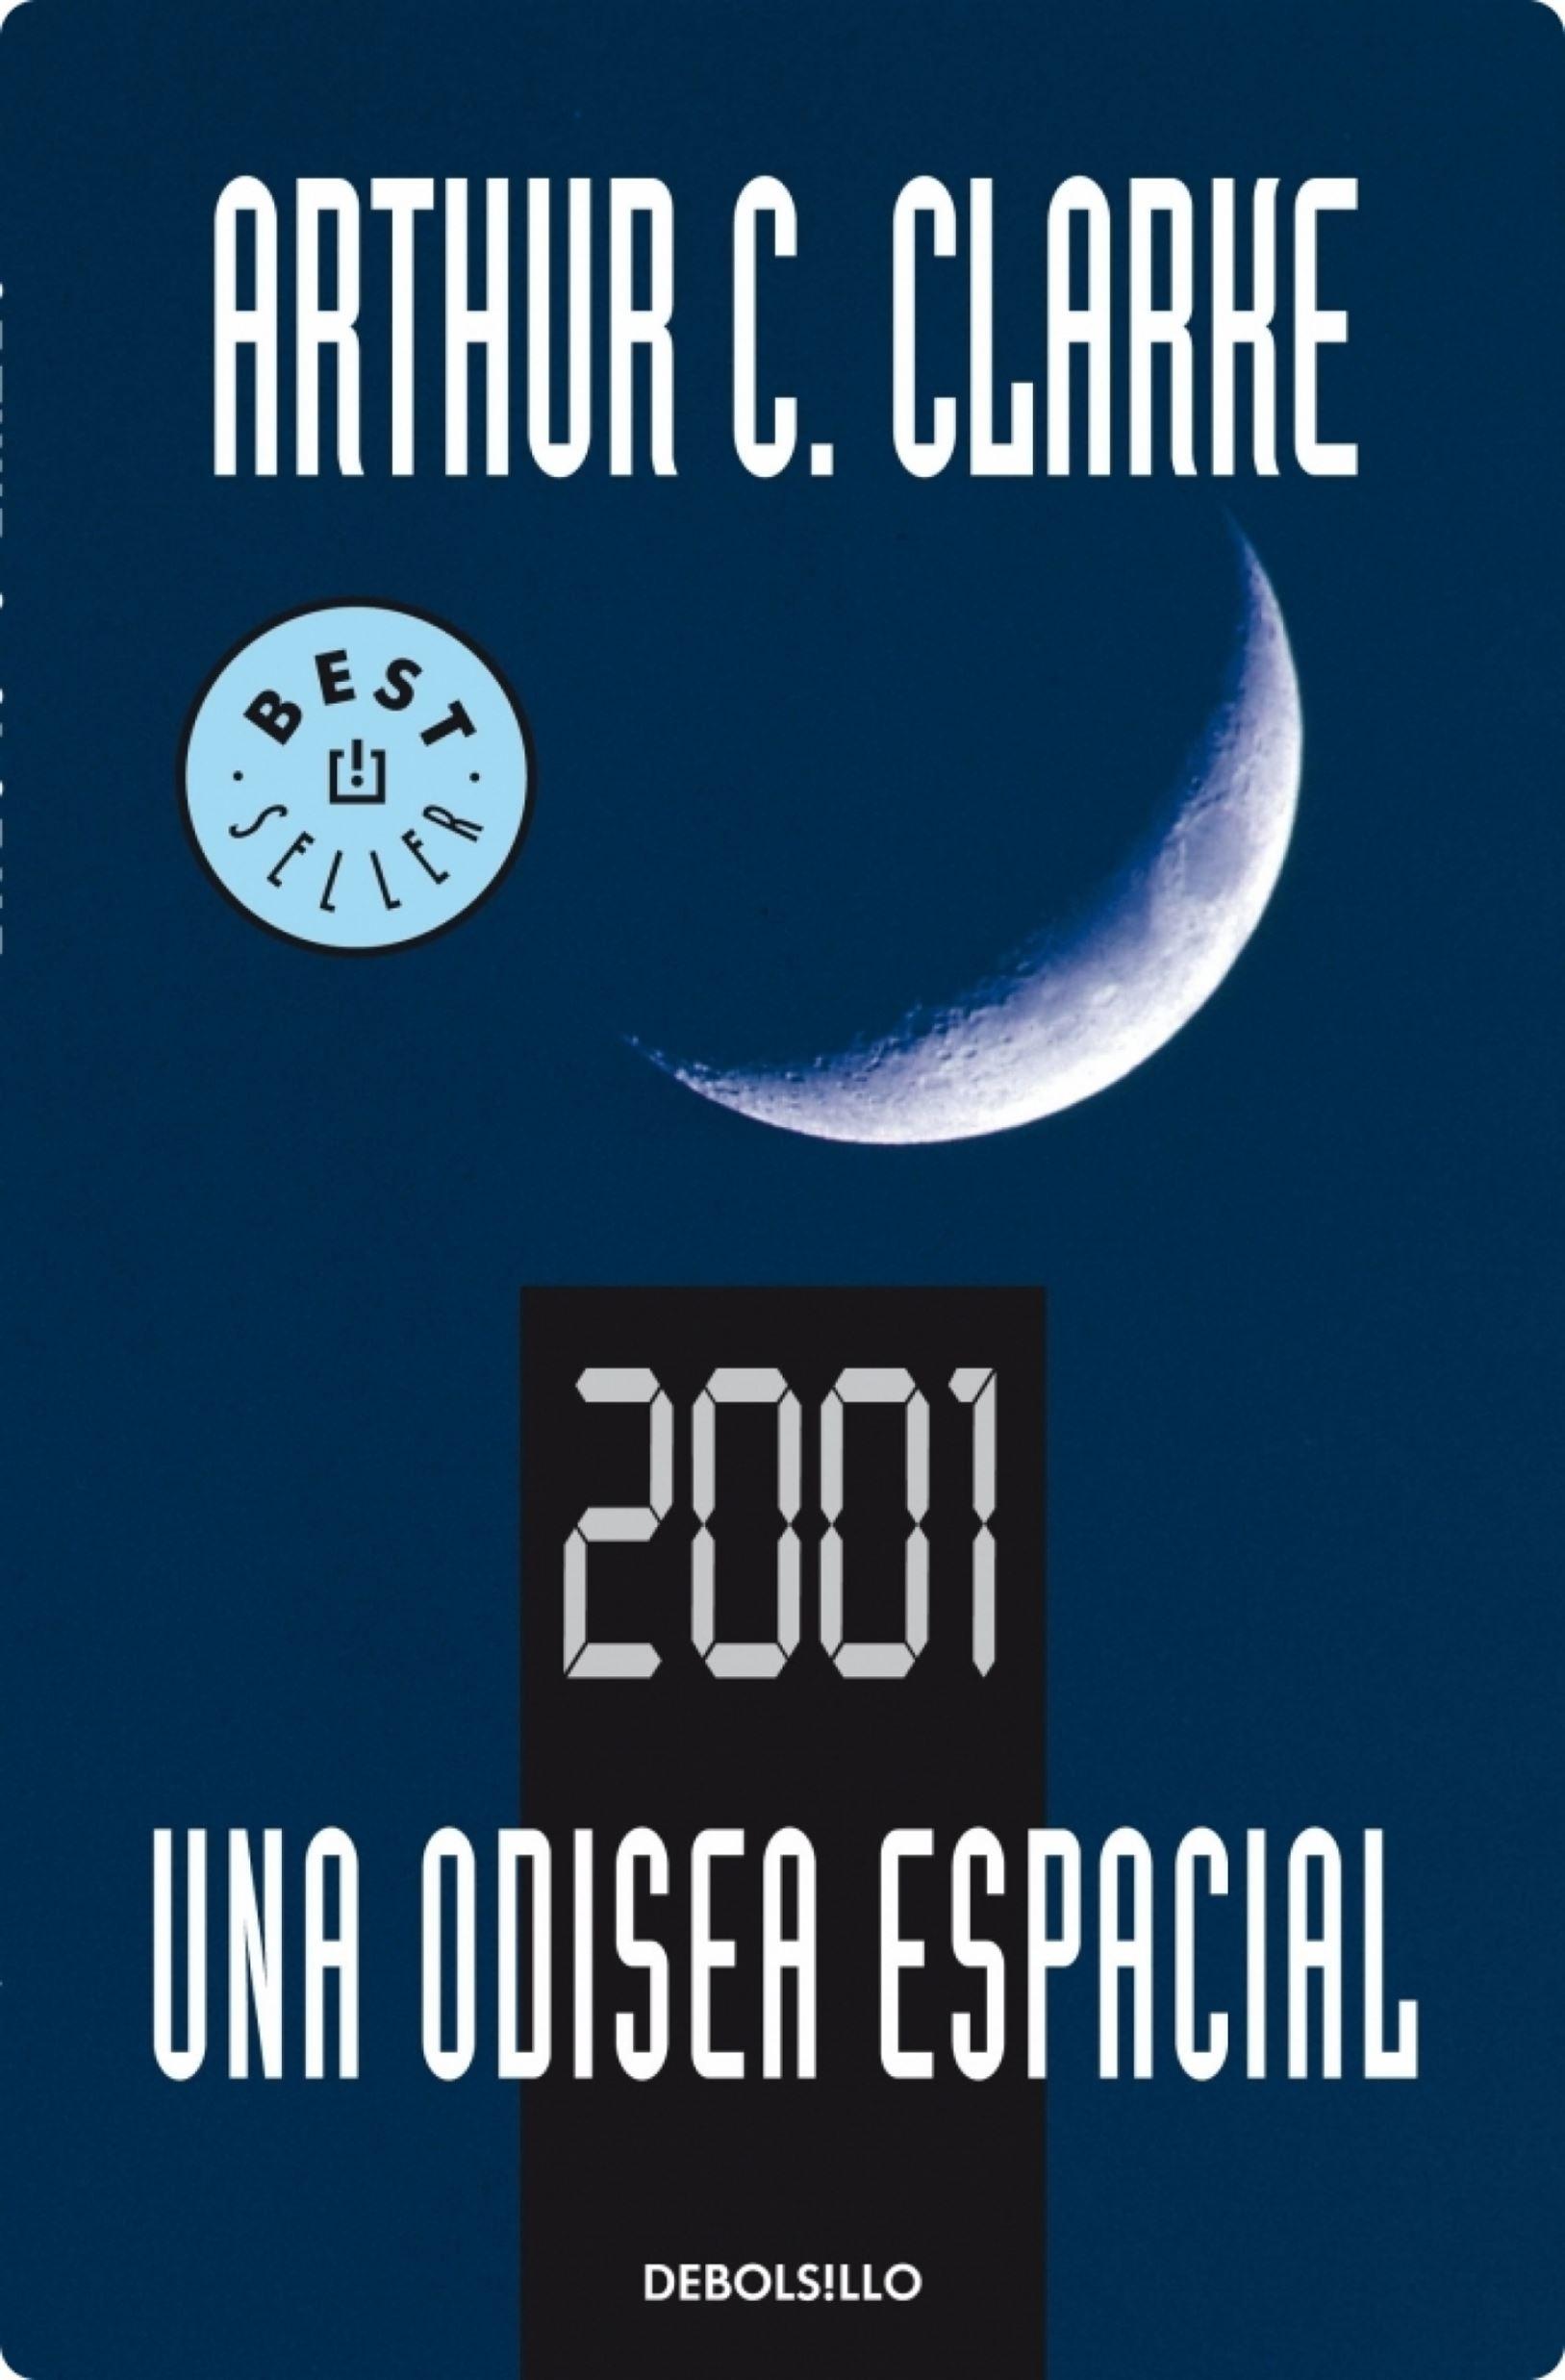 Arthur C. Clarke – 2001: A Space Odyssey (novela de 1968)